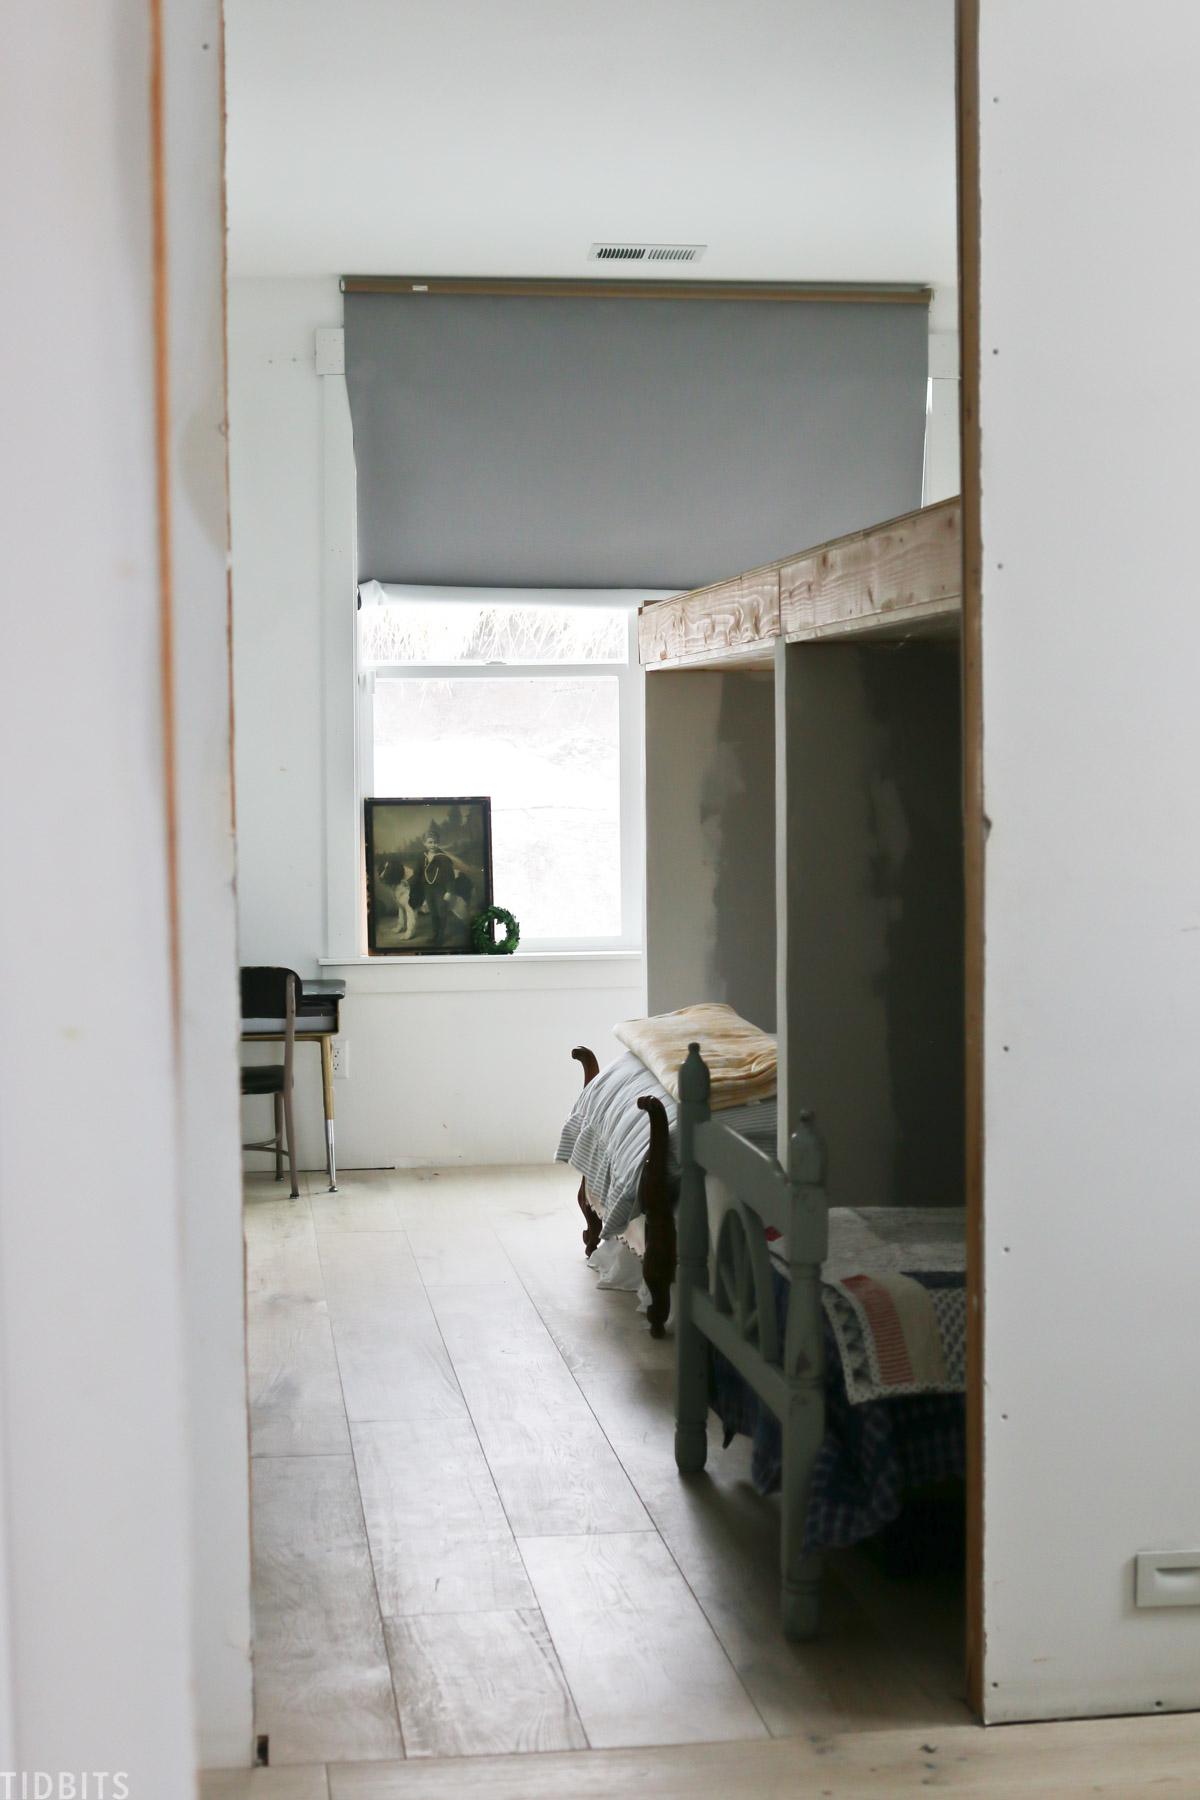 peak inside a kids' bedroom in a pole barn home, revealing two beds underneath a play loft